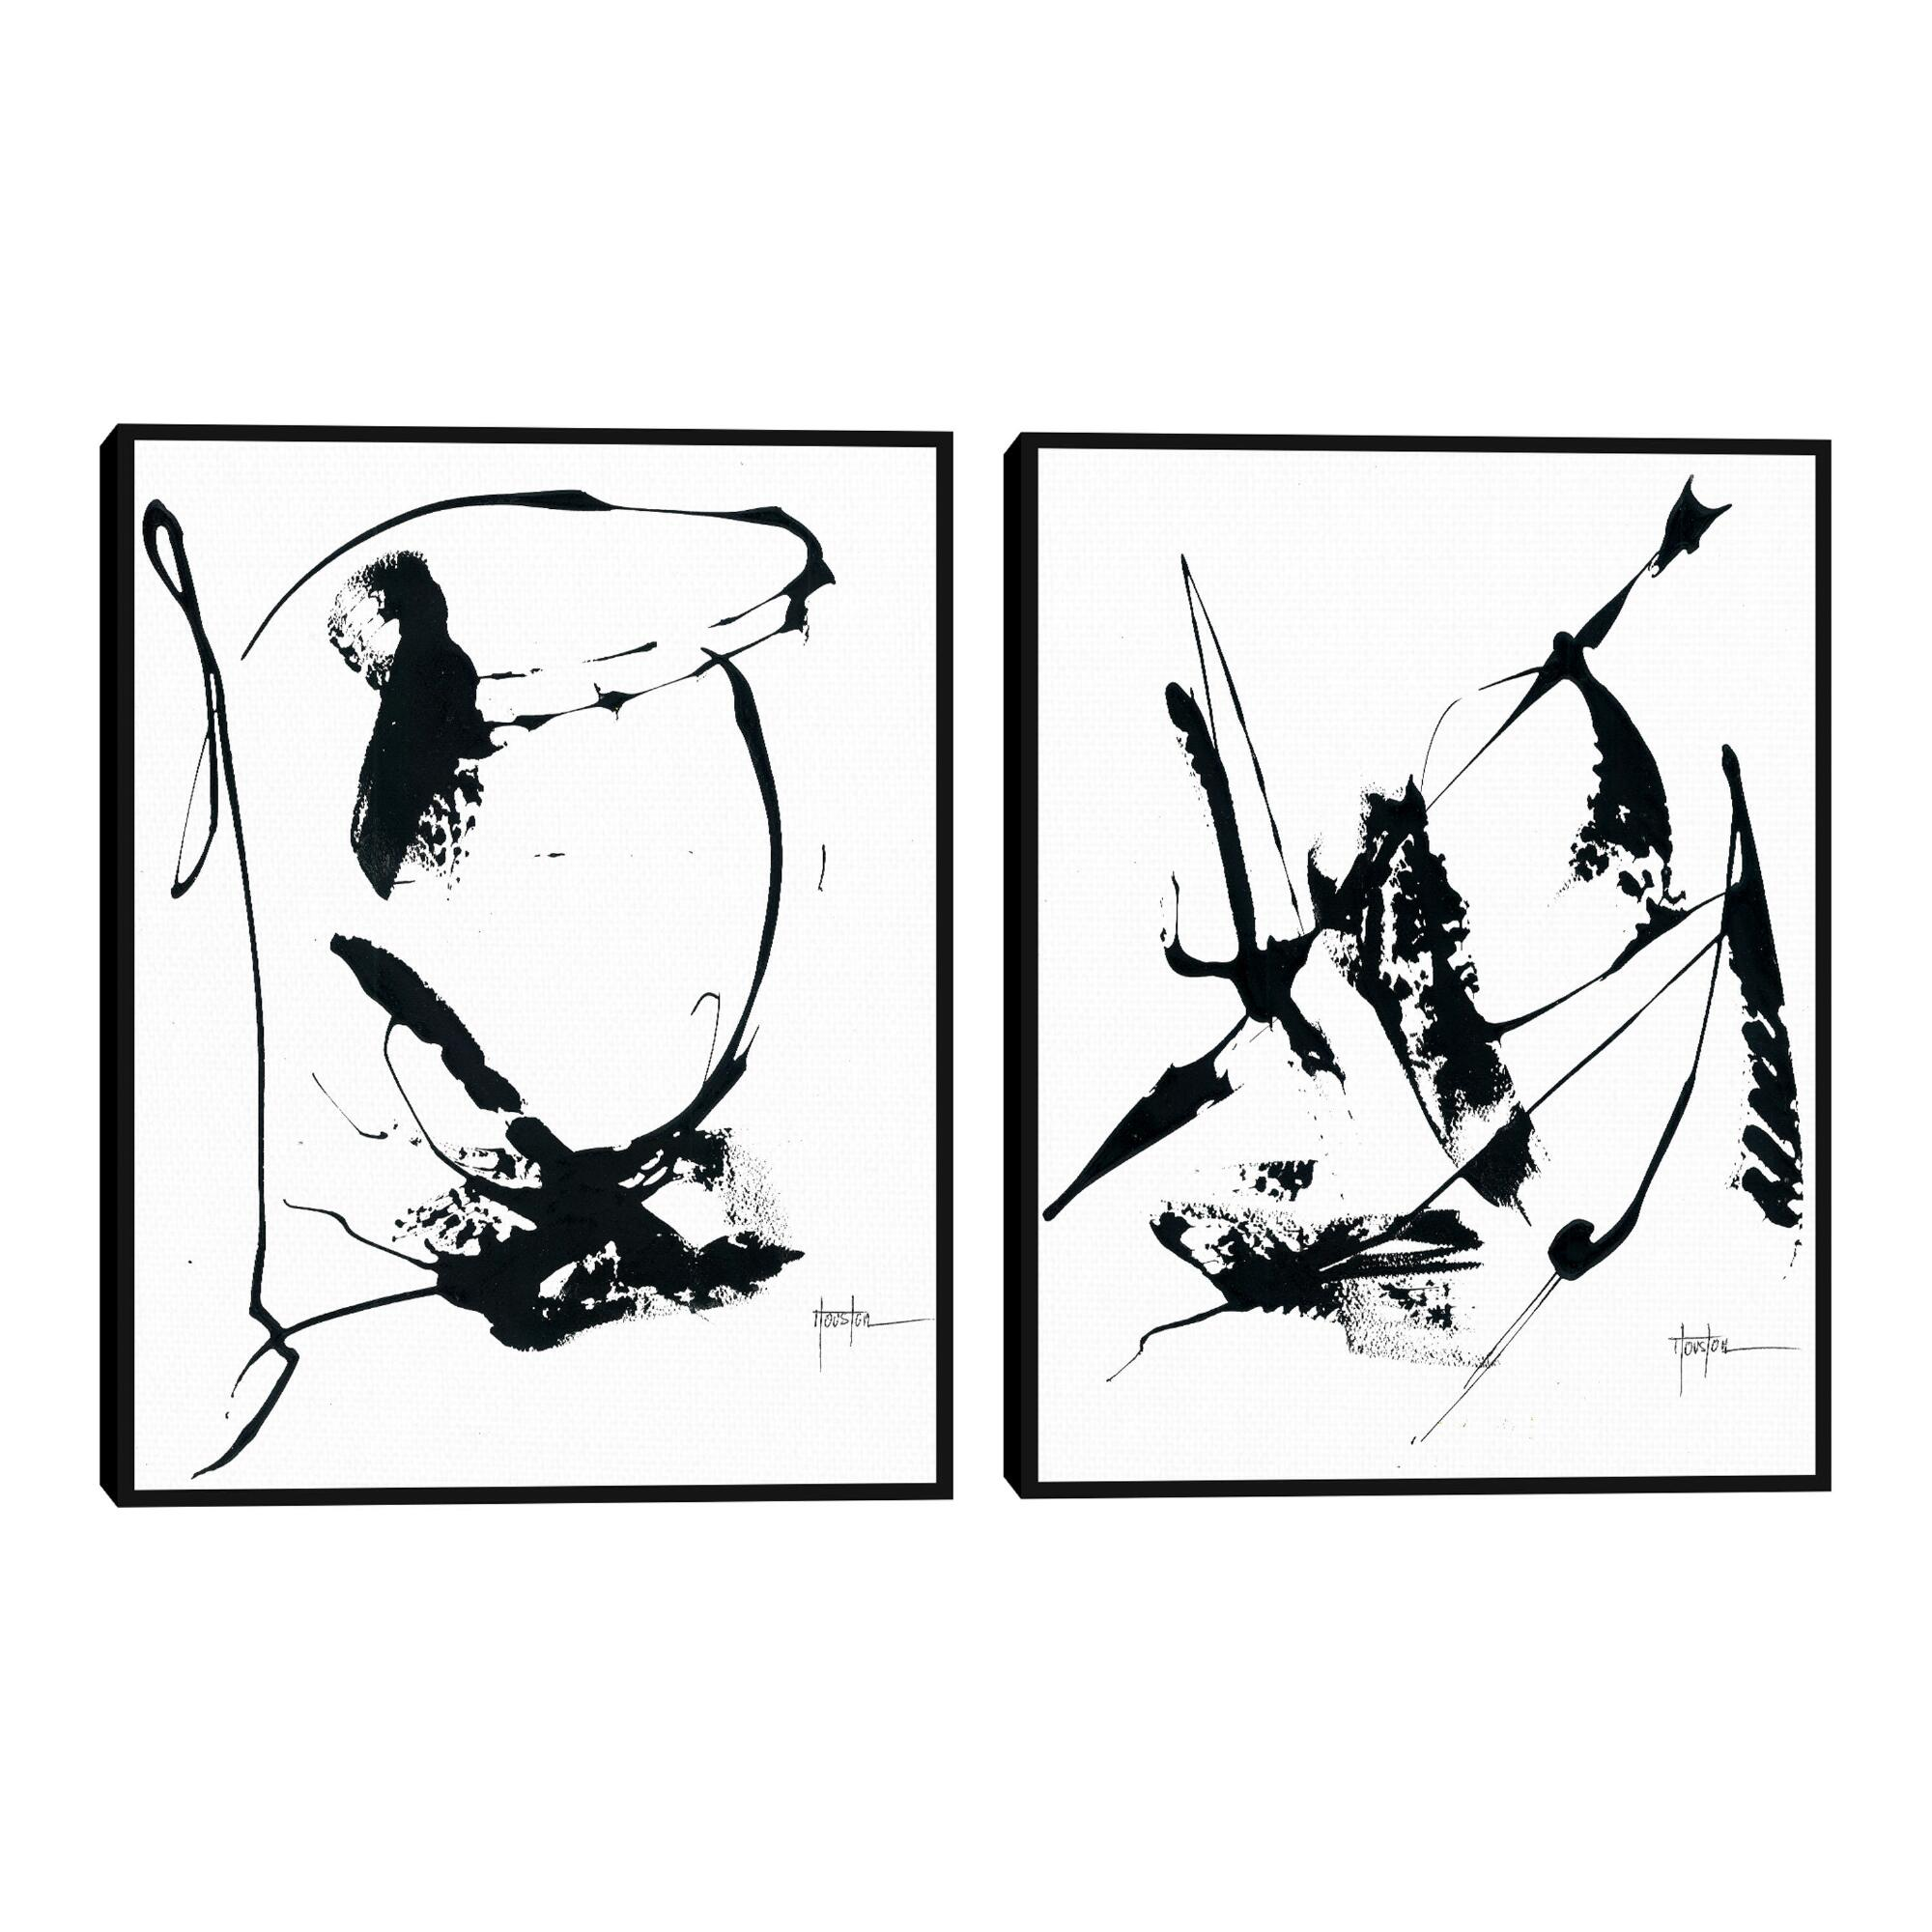 Memories By Dan Houston Framed Canvas Wall Art 2 Piece $199.99